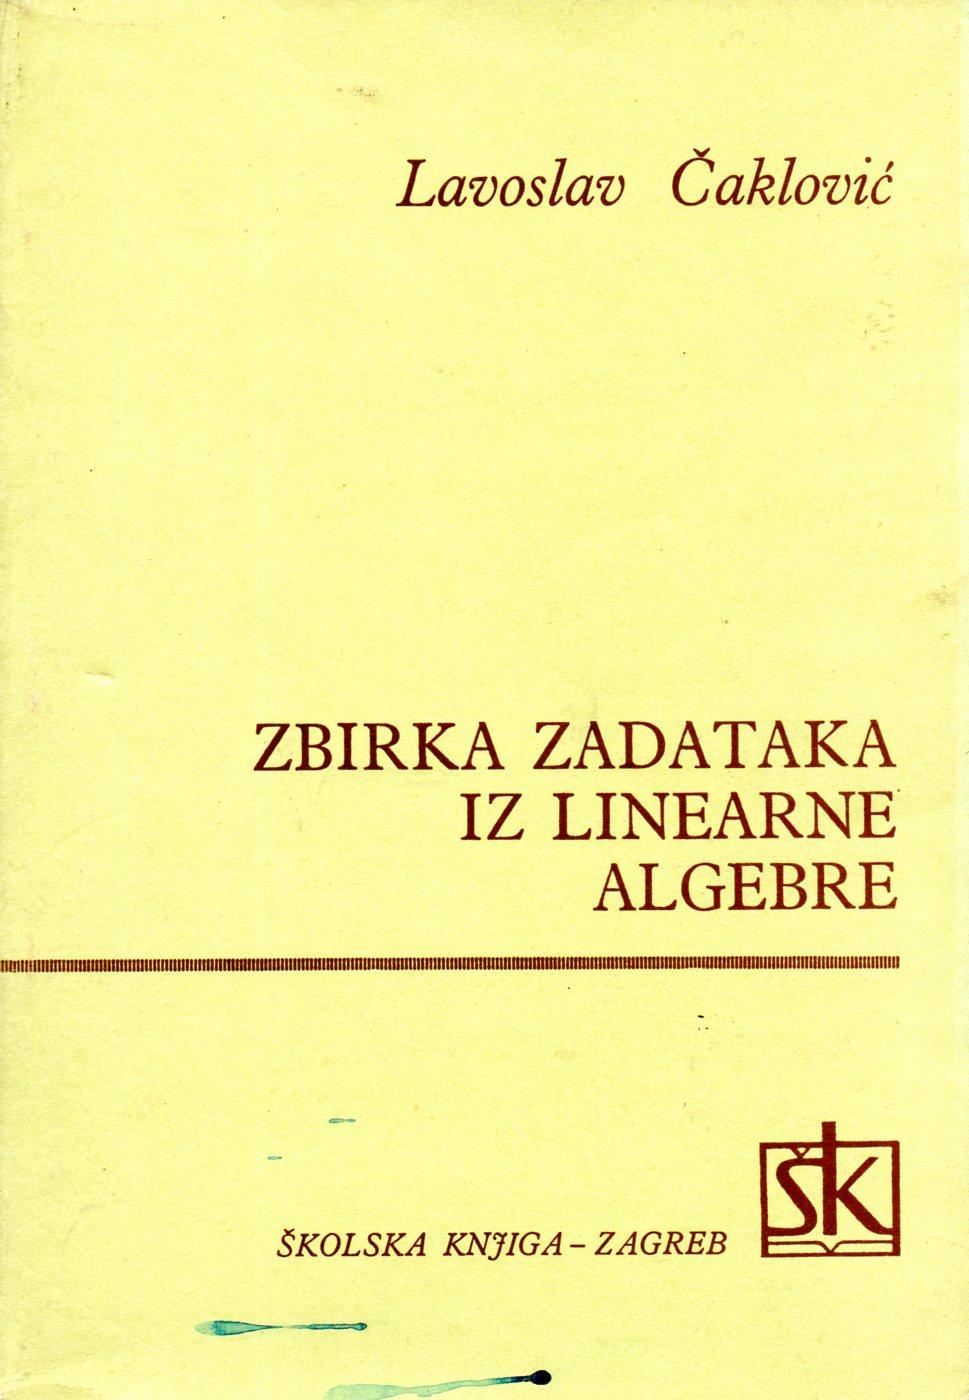 Lavoslav Čaklović: ZBIRKA ZADATAKA IZ LINEARNE ALGEBRE